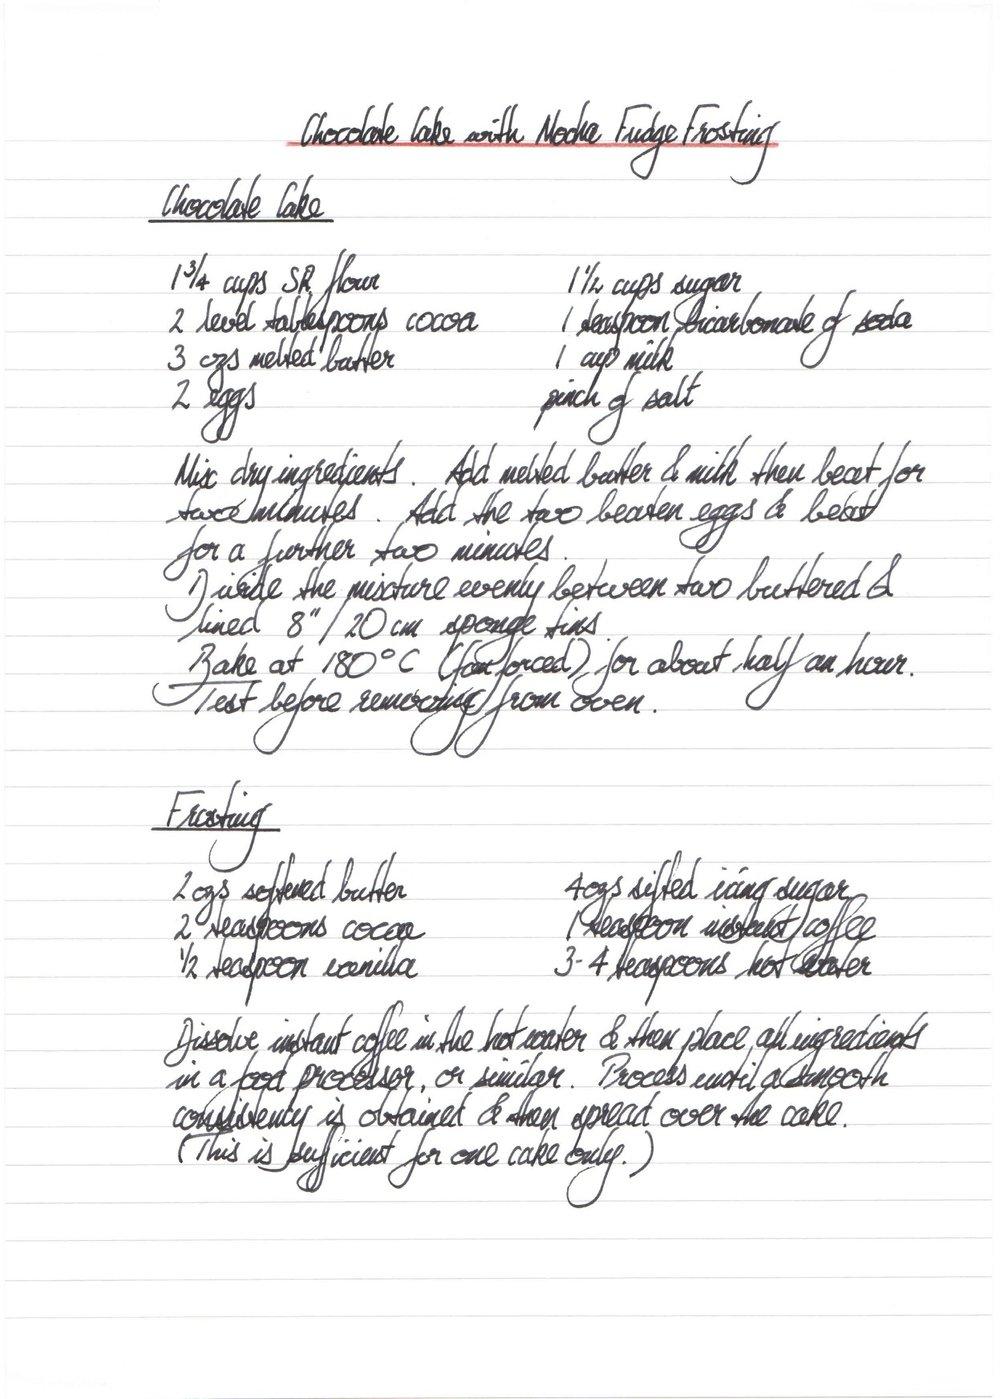 Warwick Chococake Handwritten.jpg